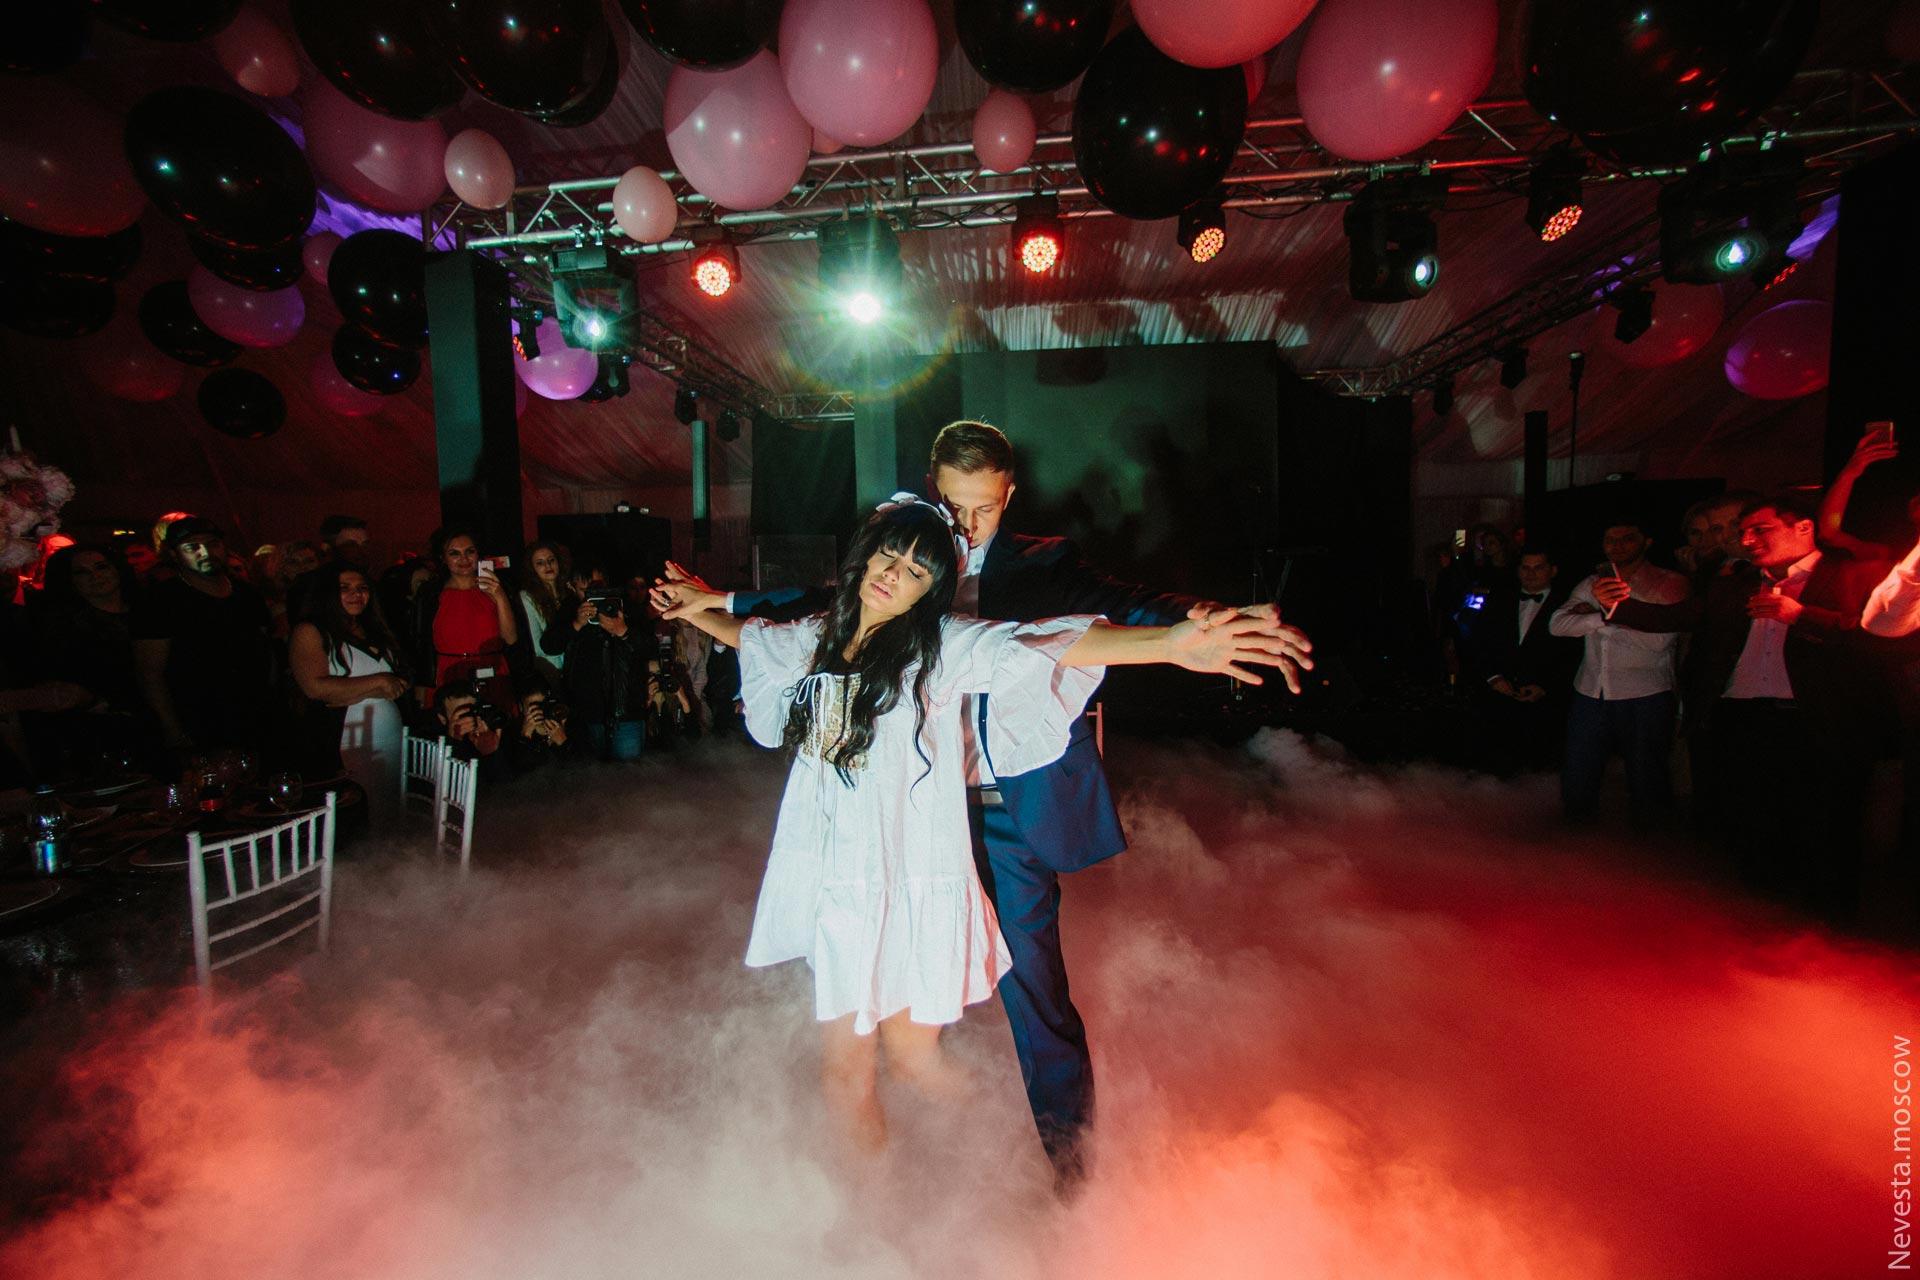 Свадьба Нелли Ермолаевой и Кирилла Андреева фото 16